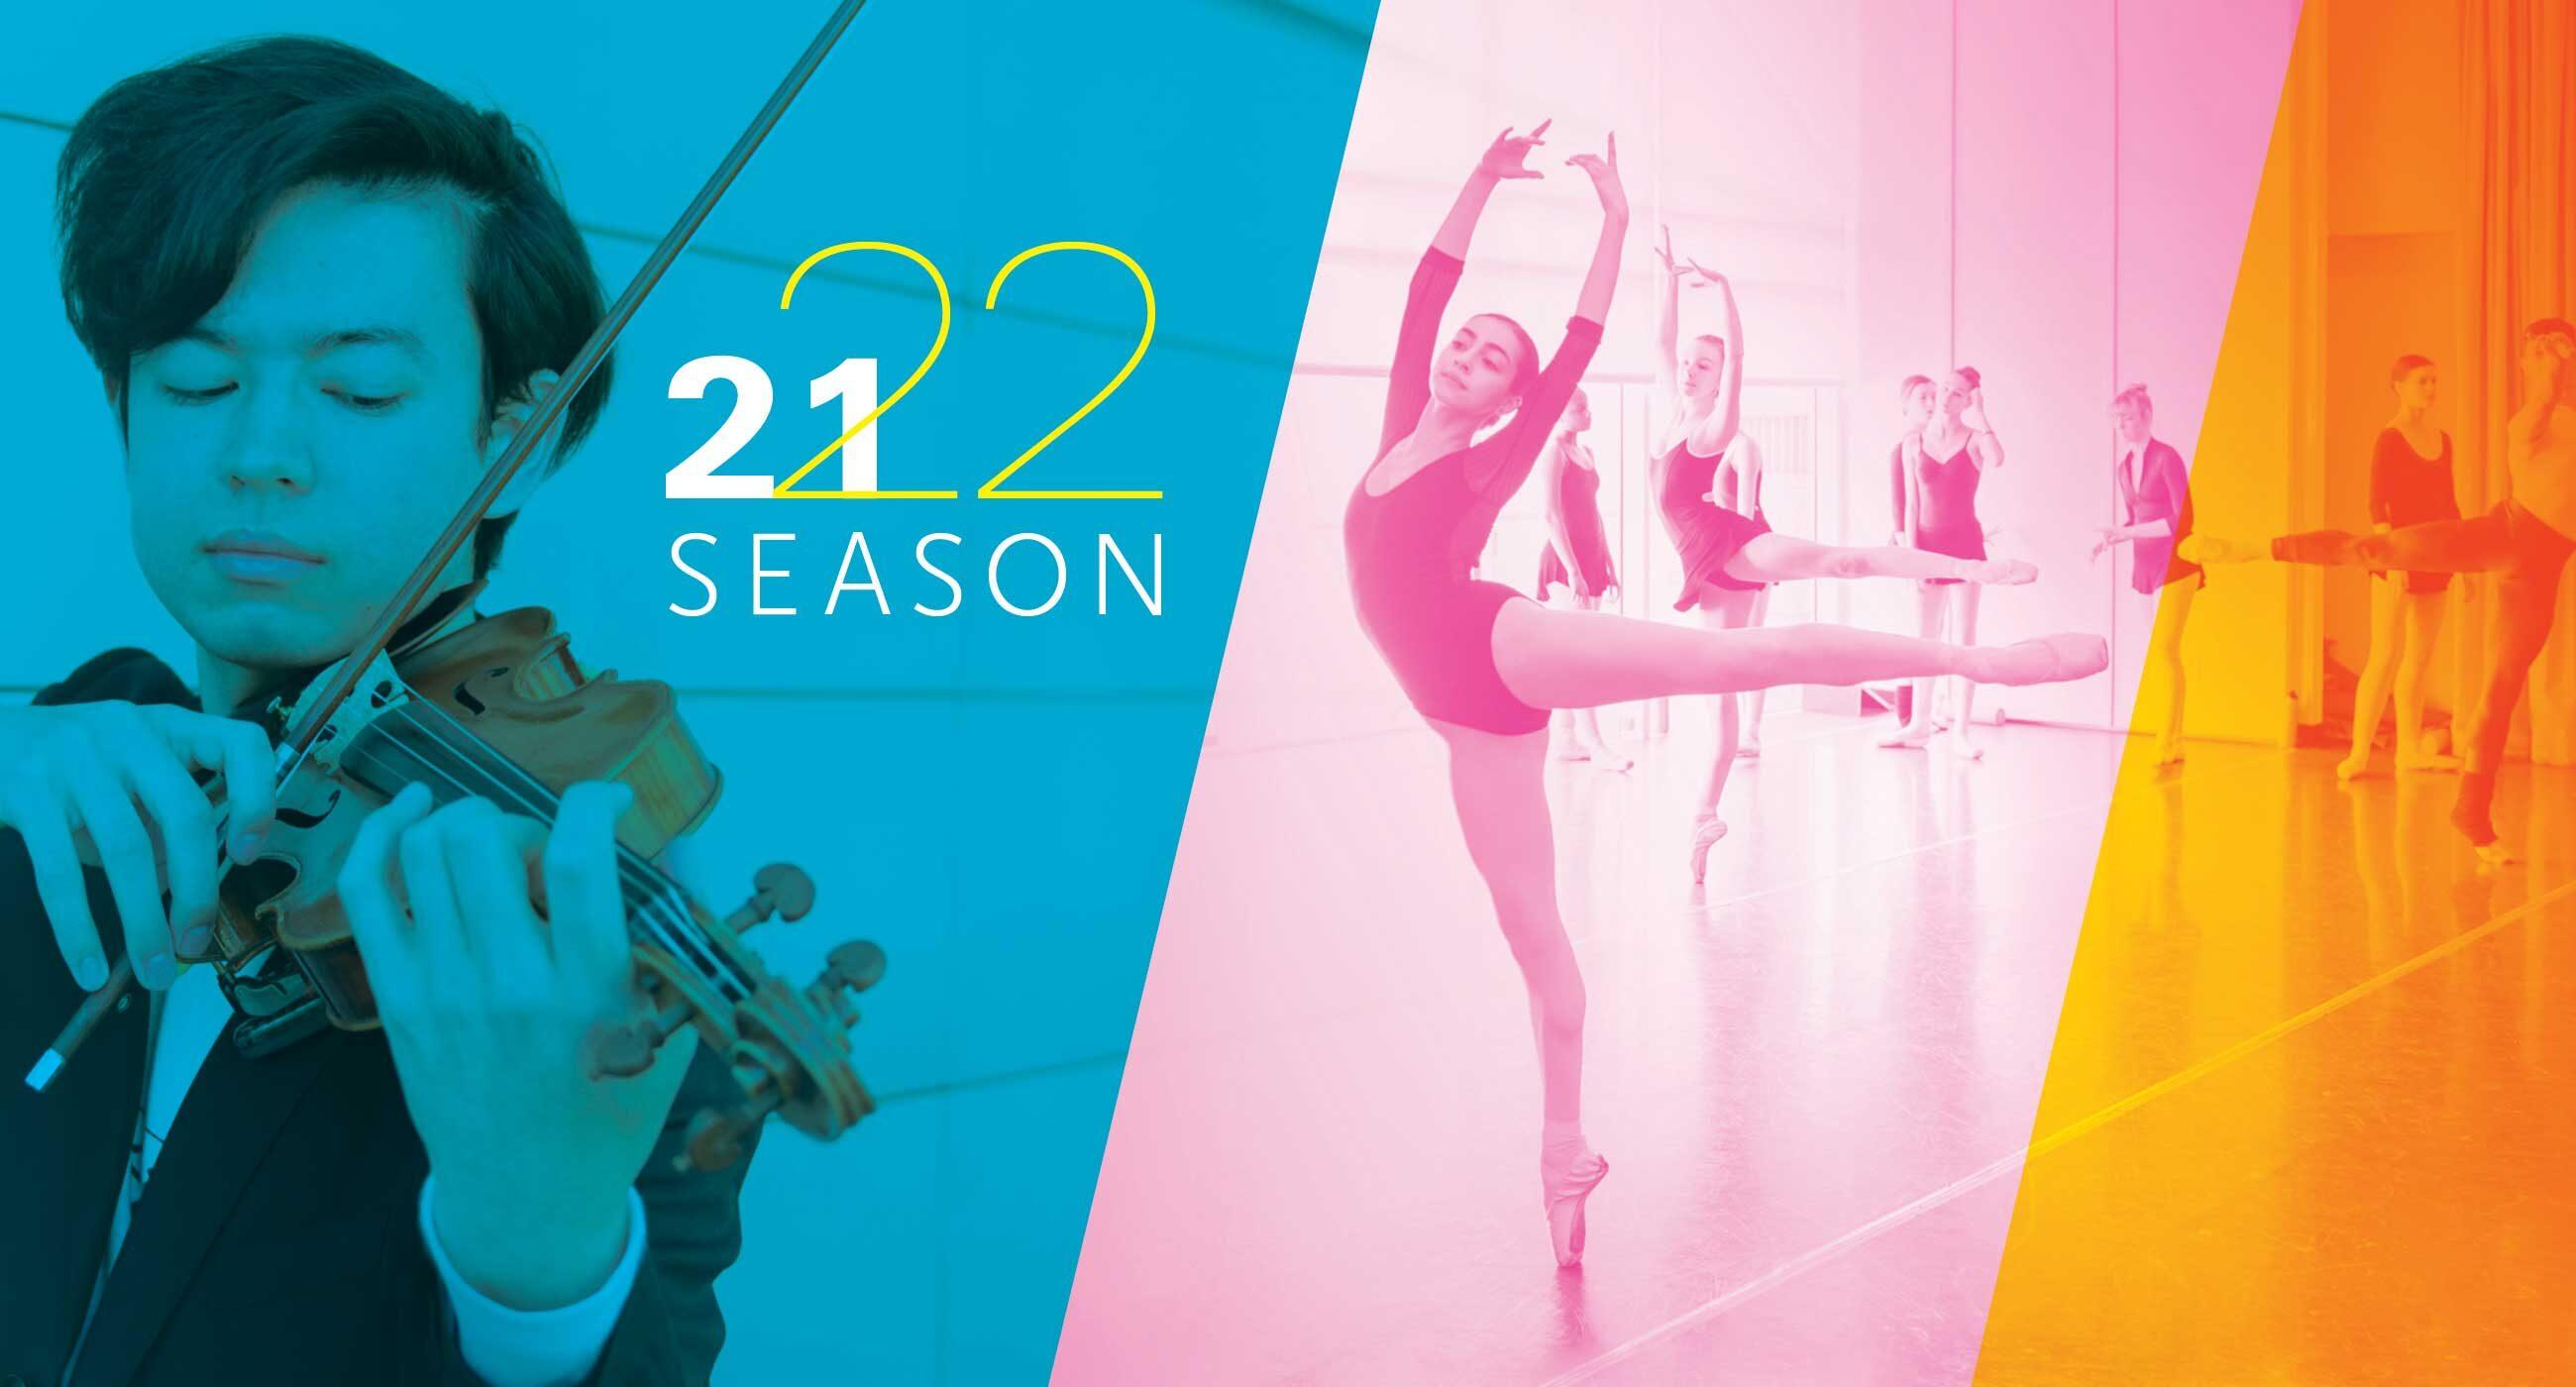 21-22 Season Overview